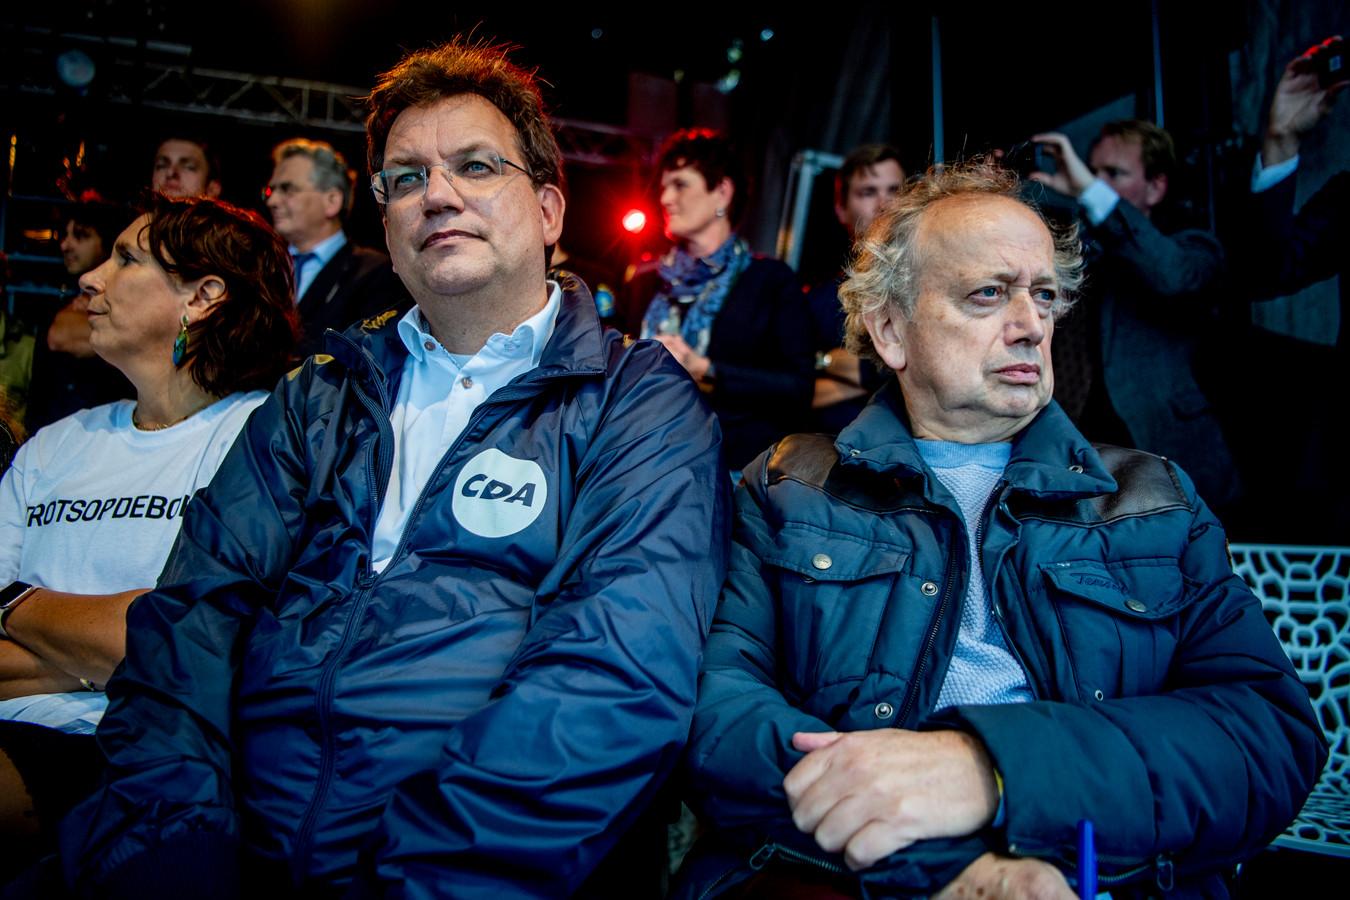 CDA-Kamerlid Jaco Geurts (links) tijdens het boerenprotest van vorige week dinsdag.